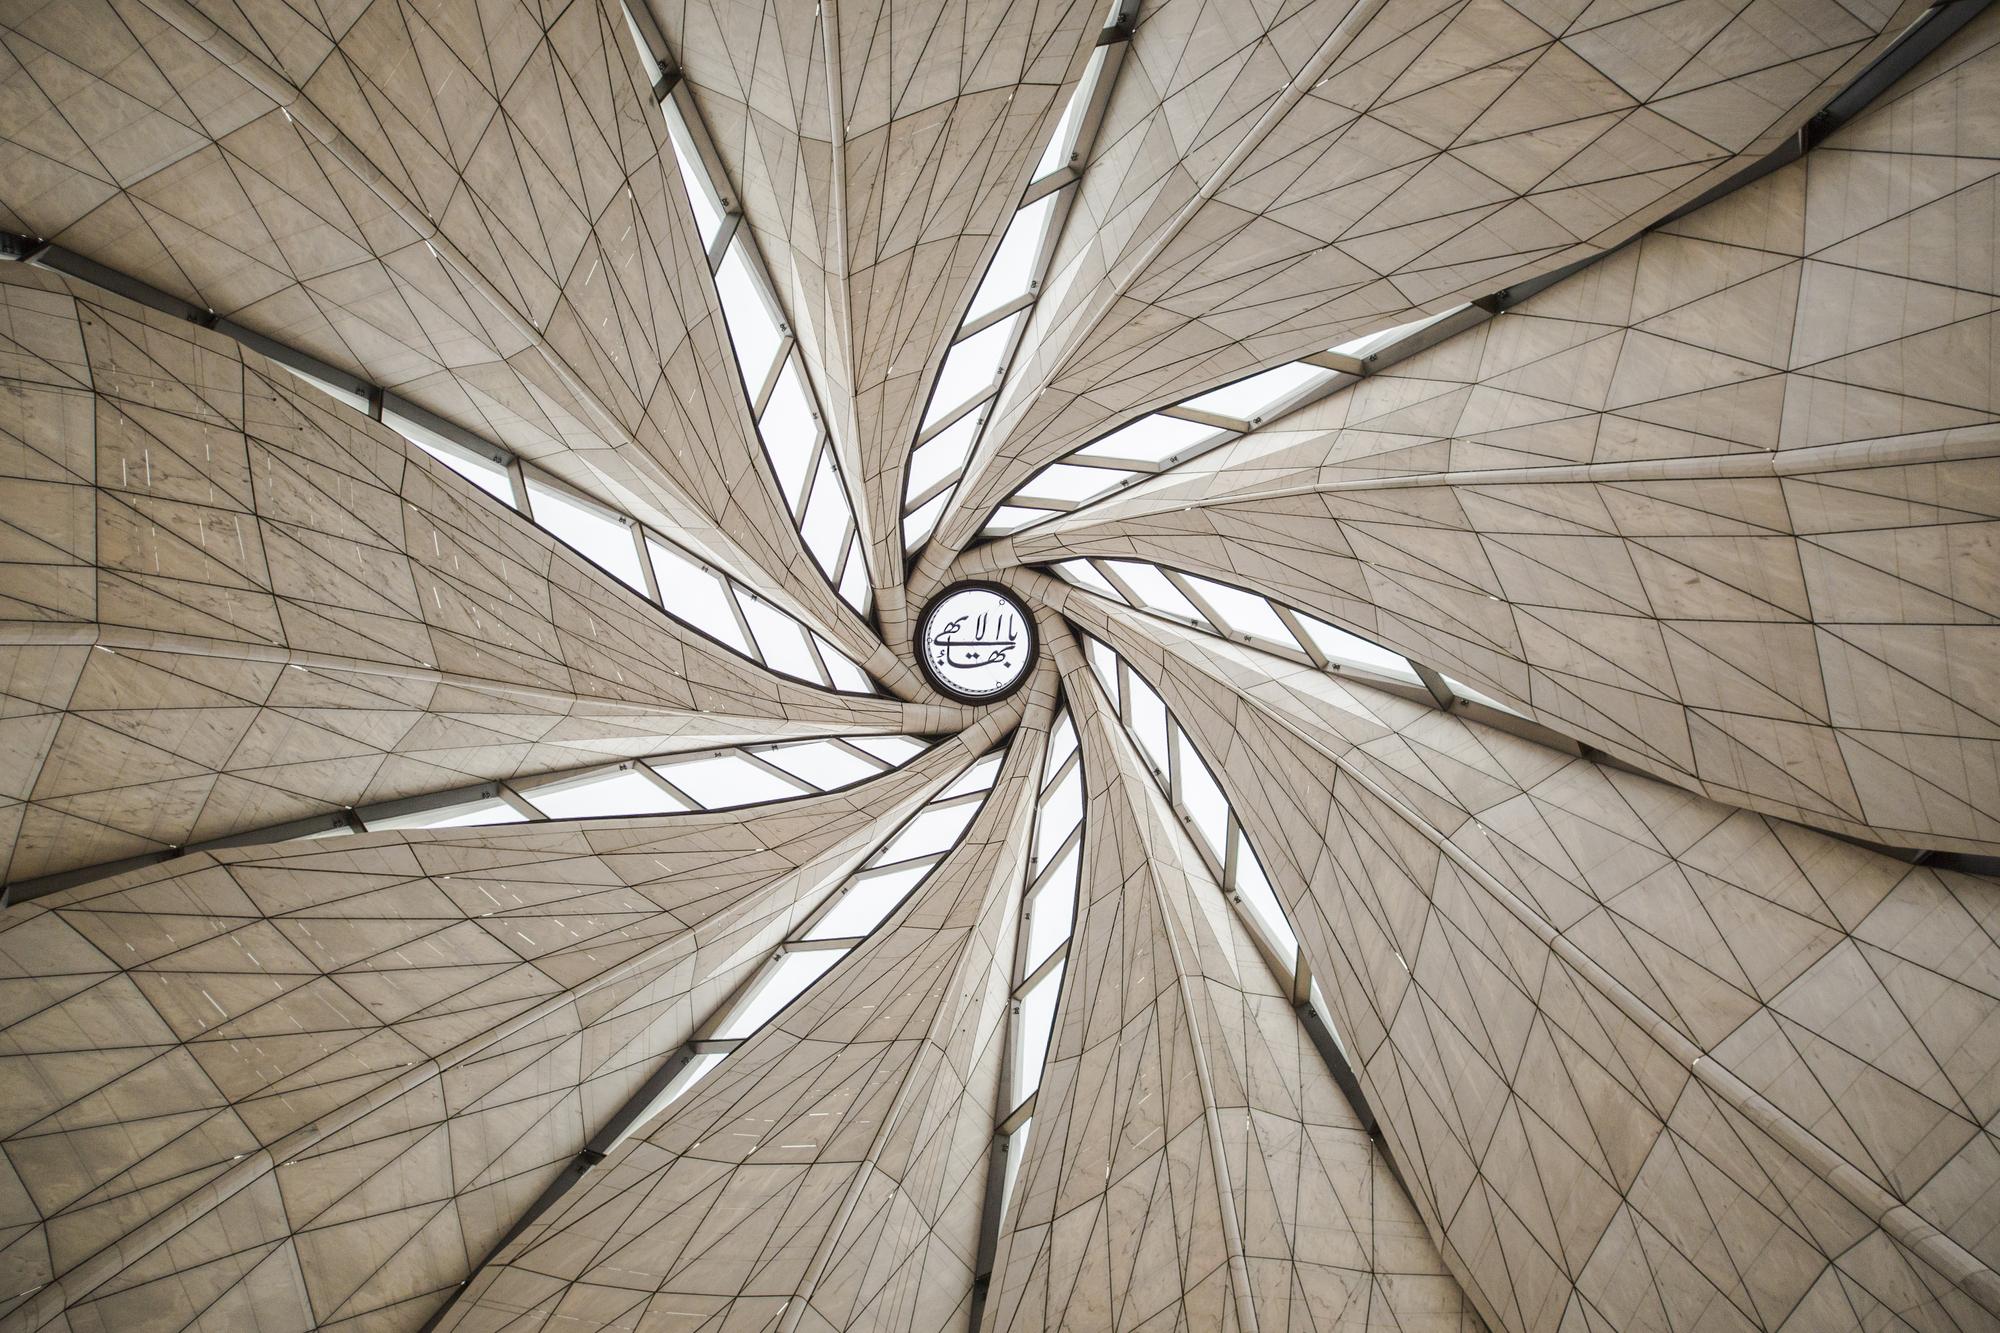 architecture aw raics innovation - HD1500×1000